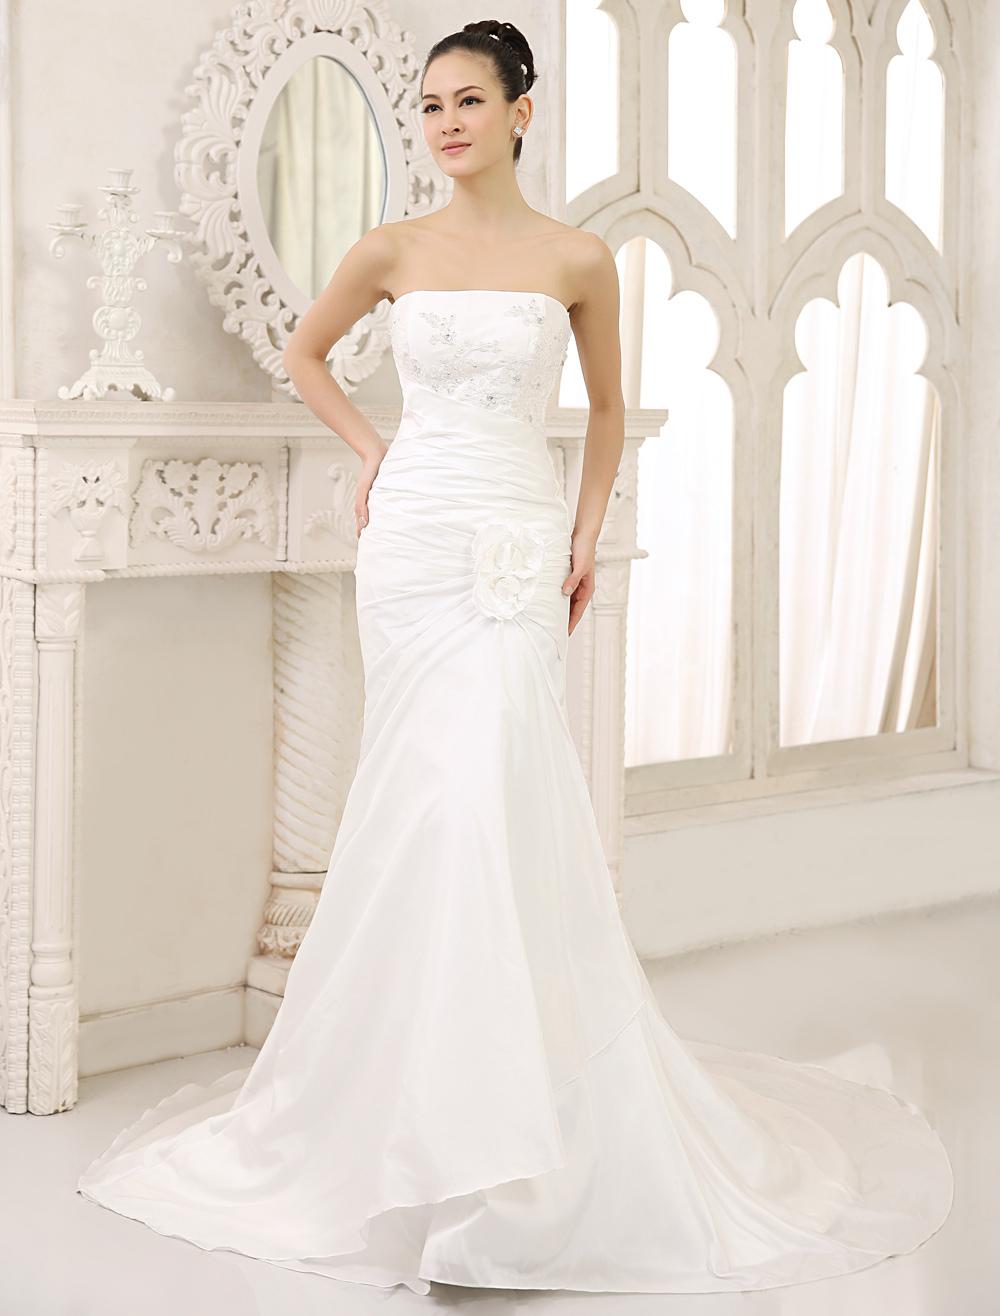 Ivory Mermaid Strapless Flower Sweep Wedding Dress For Bride Milanoo